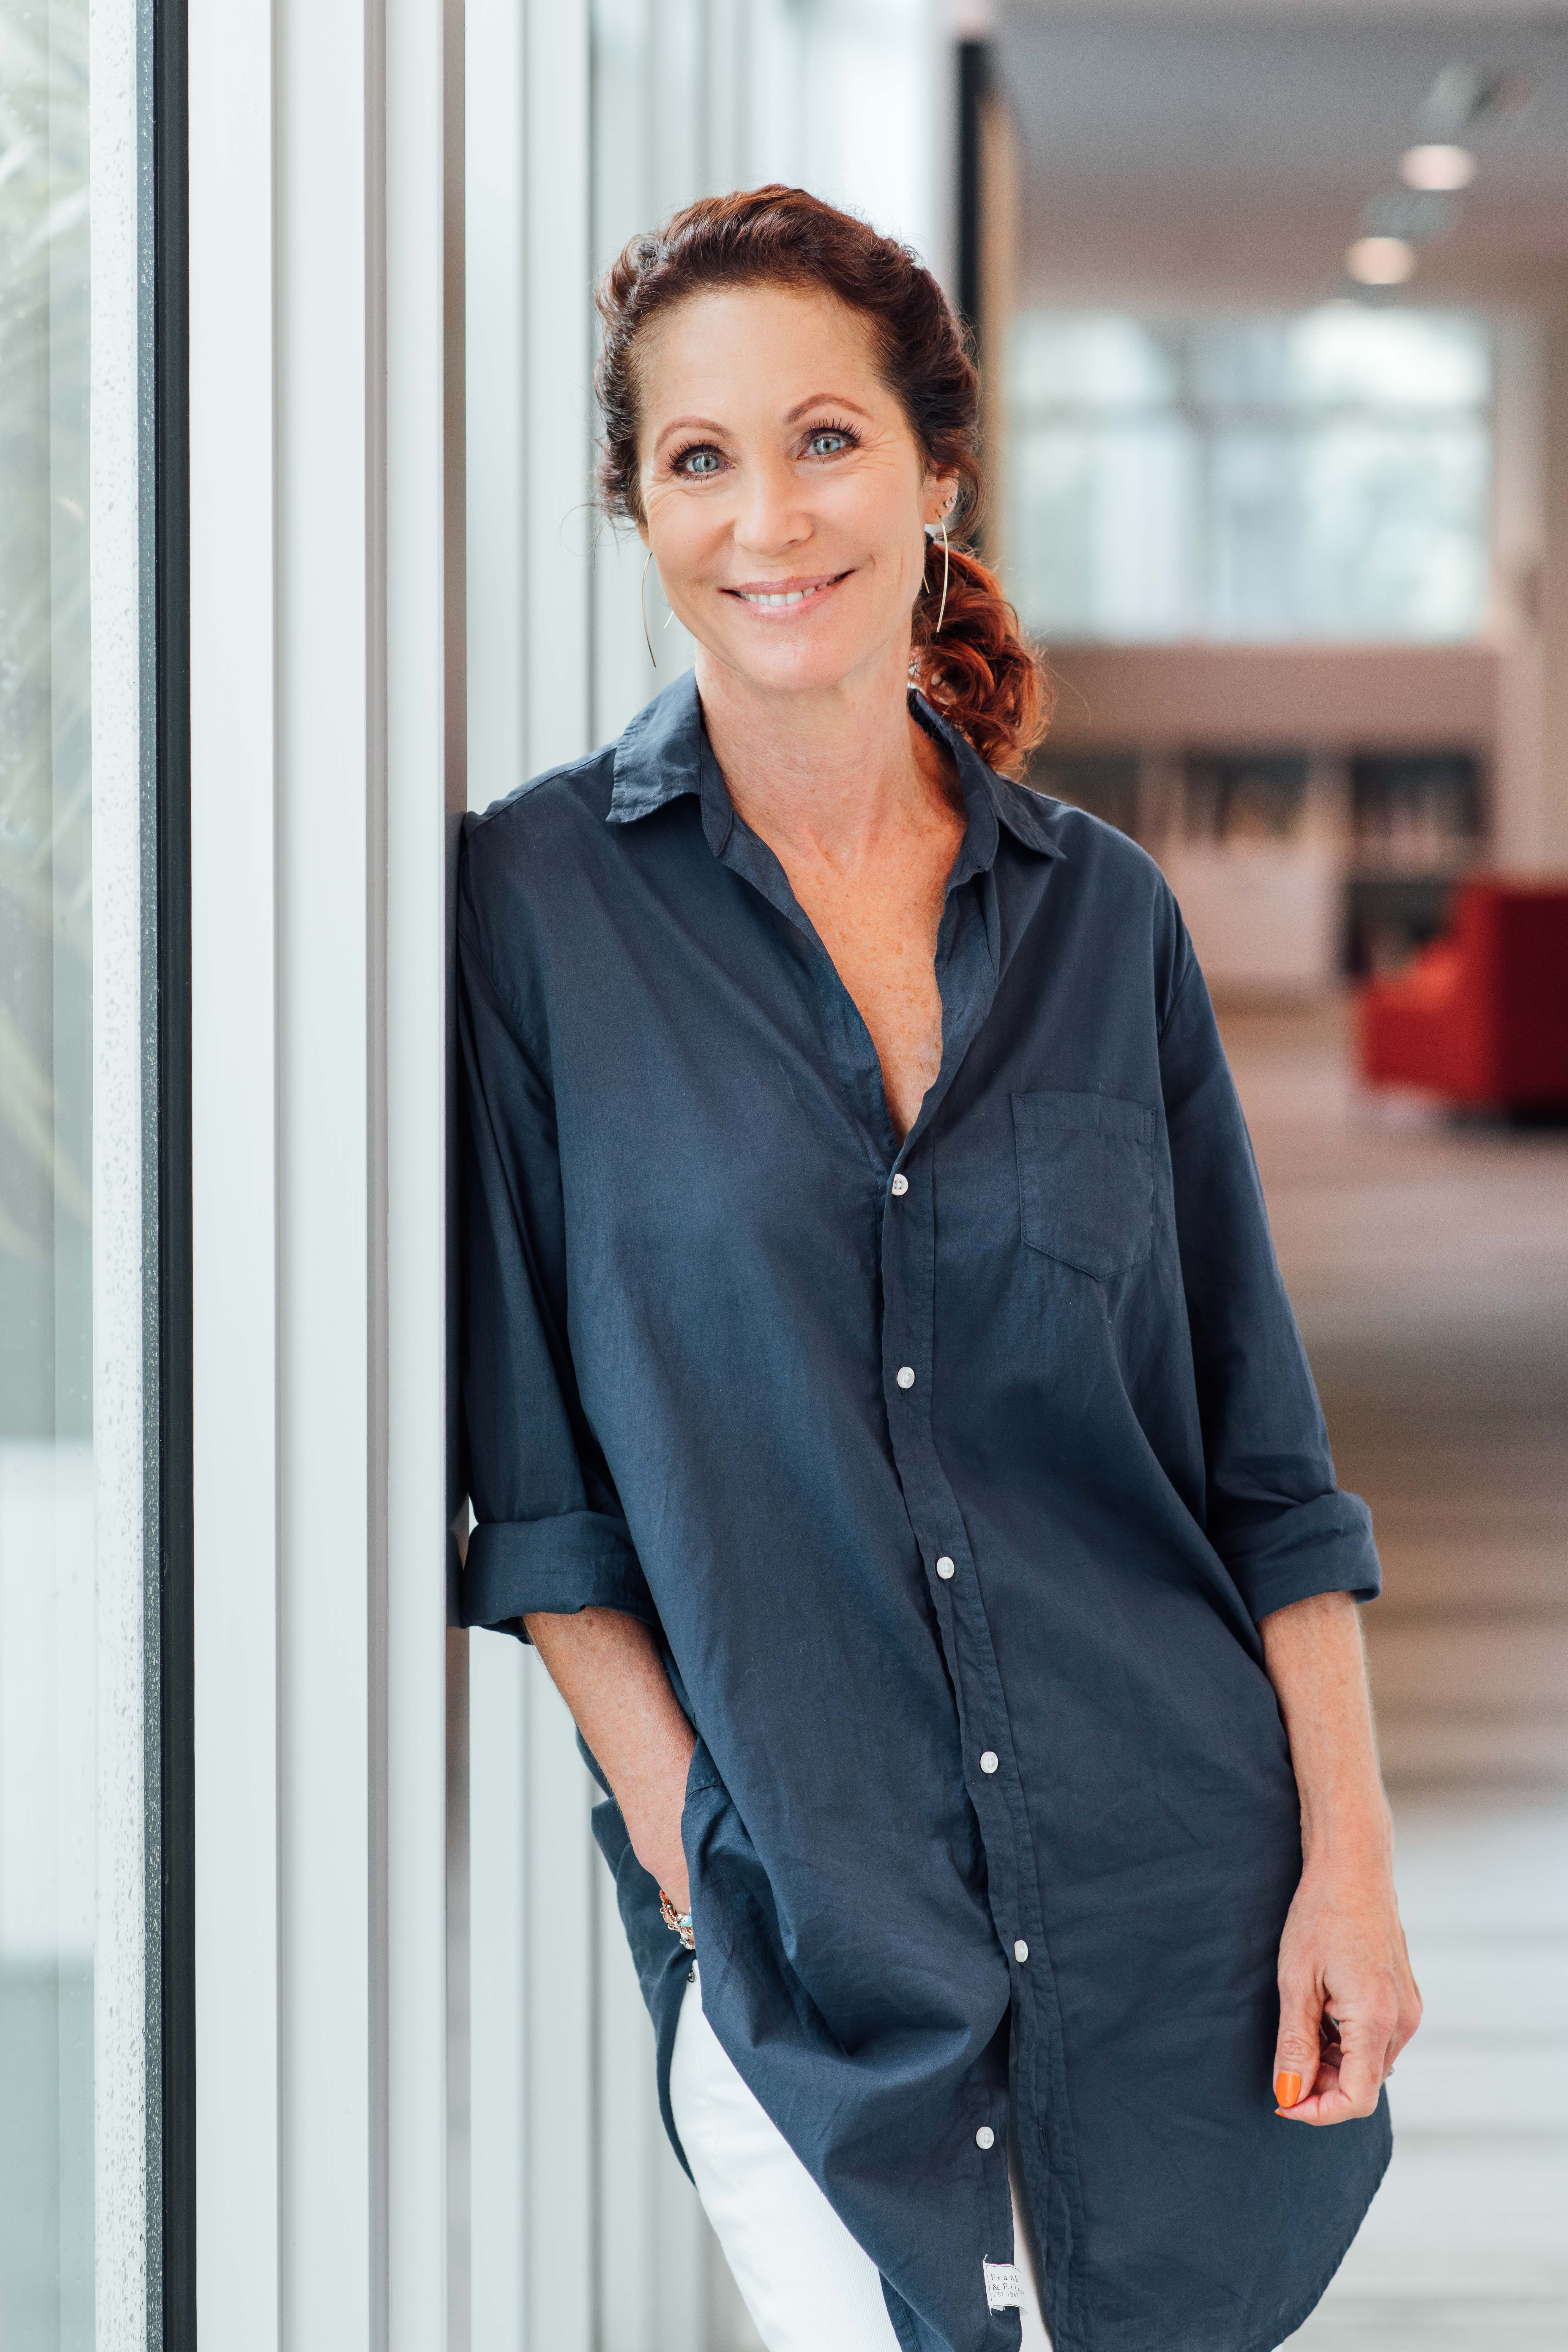 Debi Wechsler, trustee, Institute of Contemporary Art, Miami